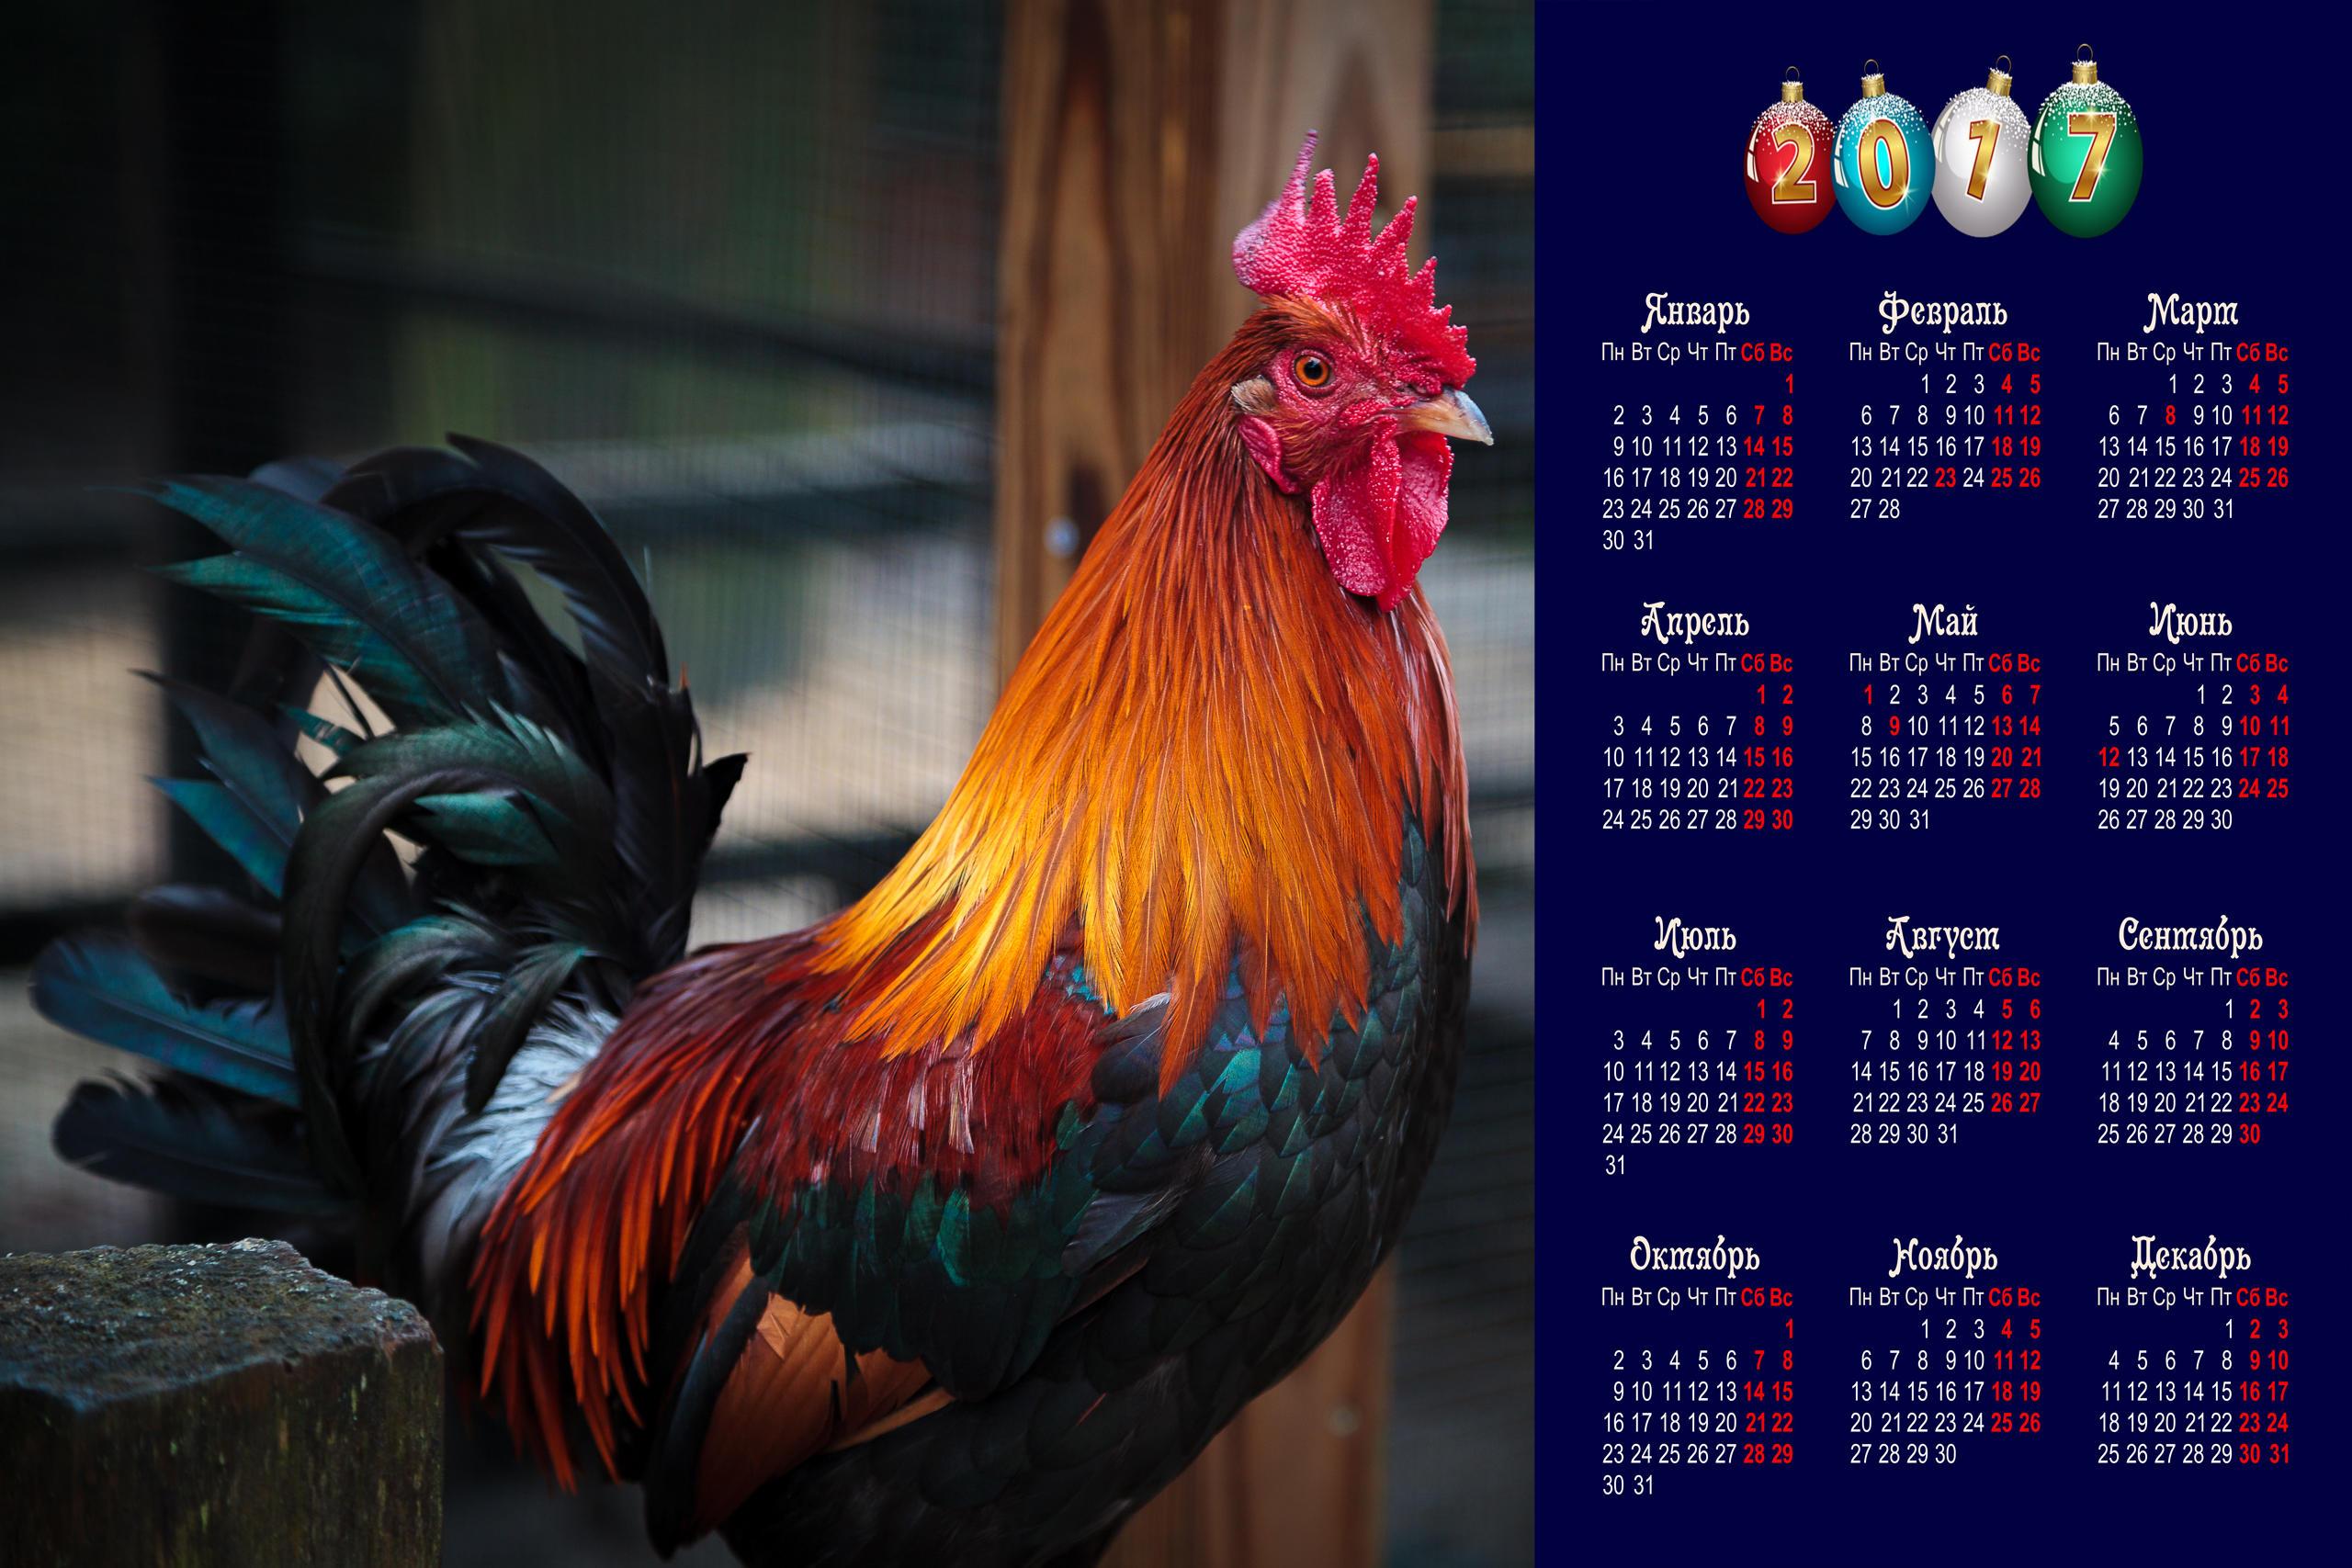 обои 2017 год Красного Огненного Петуха, Петух символ 2017 года, Петух, птица картинки фото